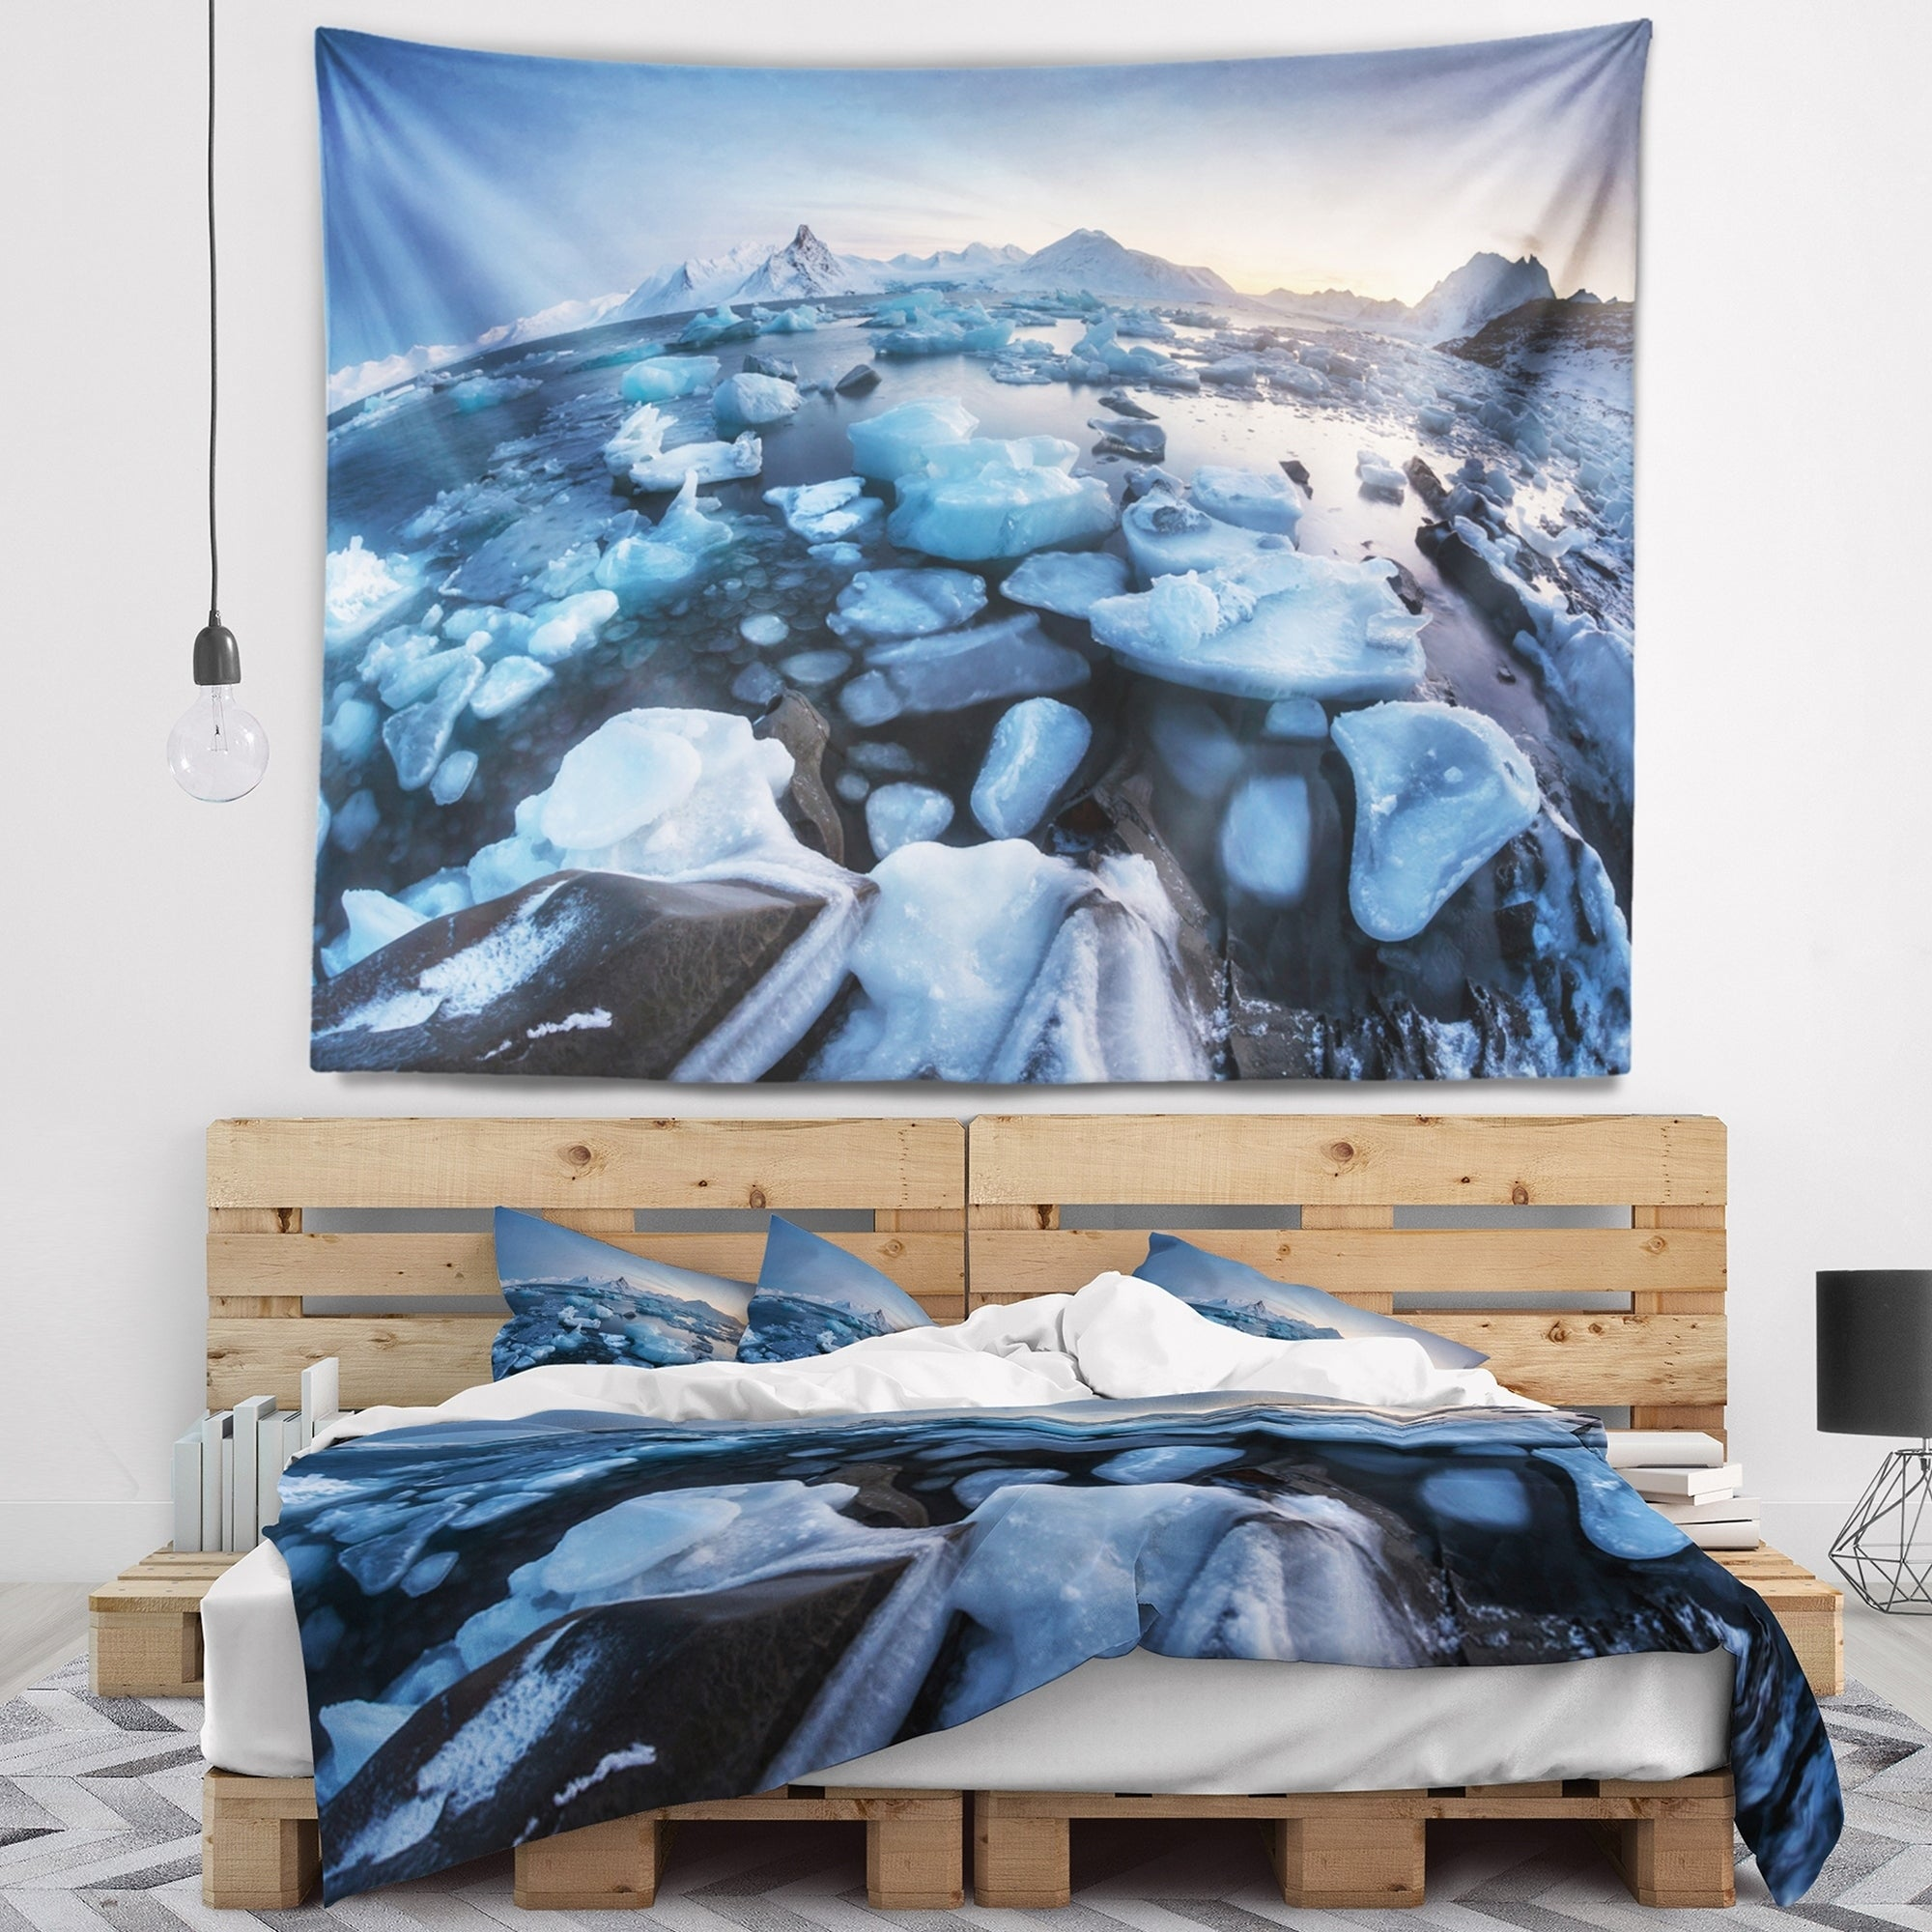 Designart Unusual Arctic Ice Landscape Seashore Wall Tapestry Overstock 20925076